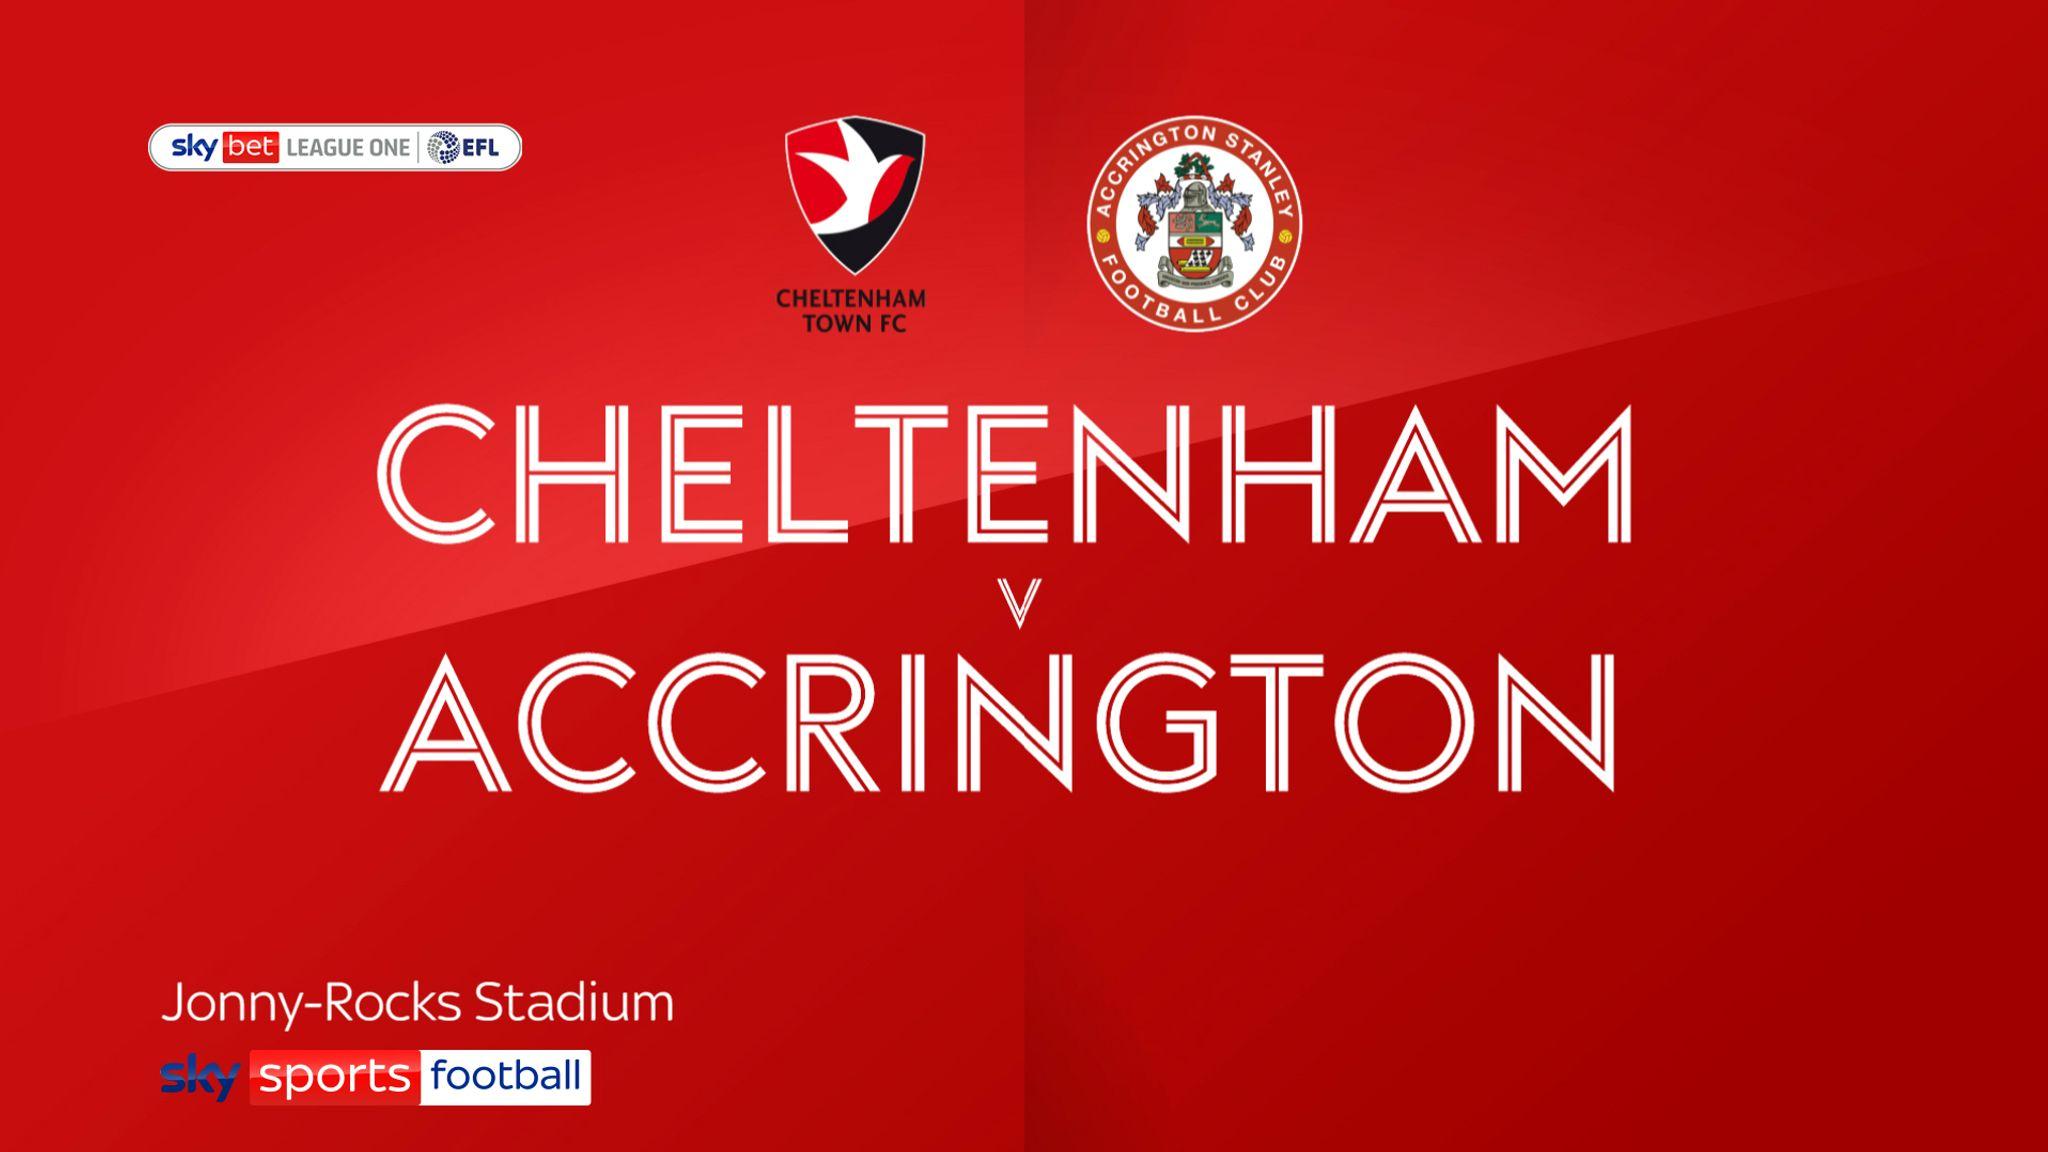 Cheltenham 1-0 Accrington: Kyle Vassell's first league goal ends three-game losing run